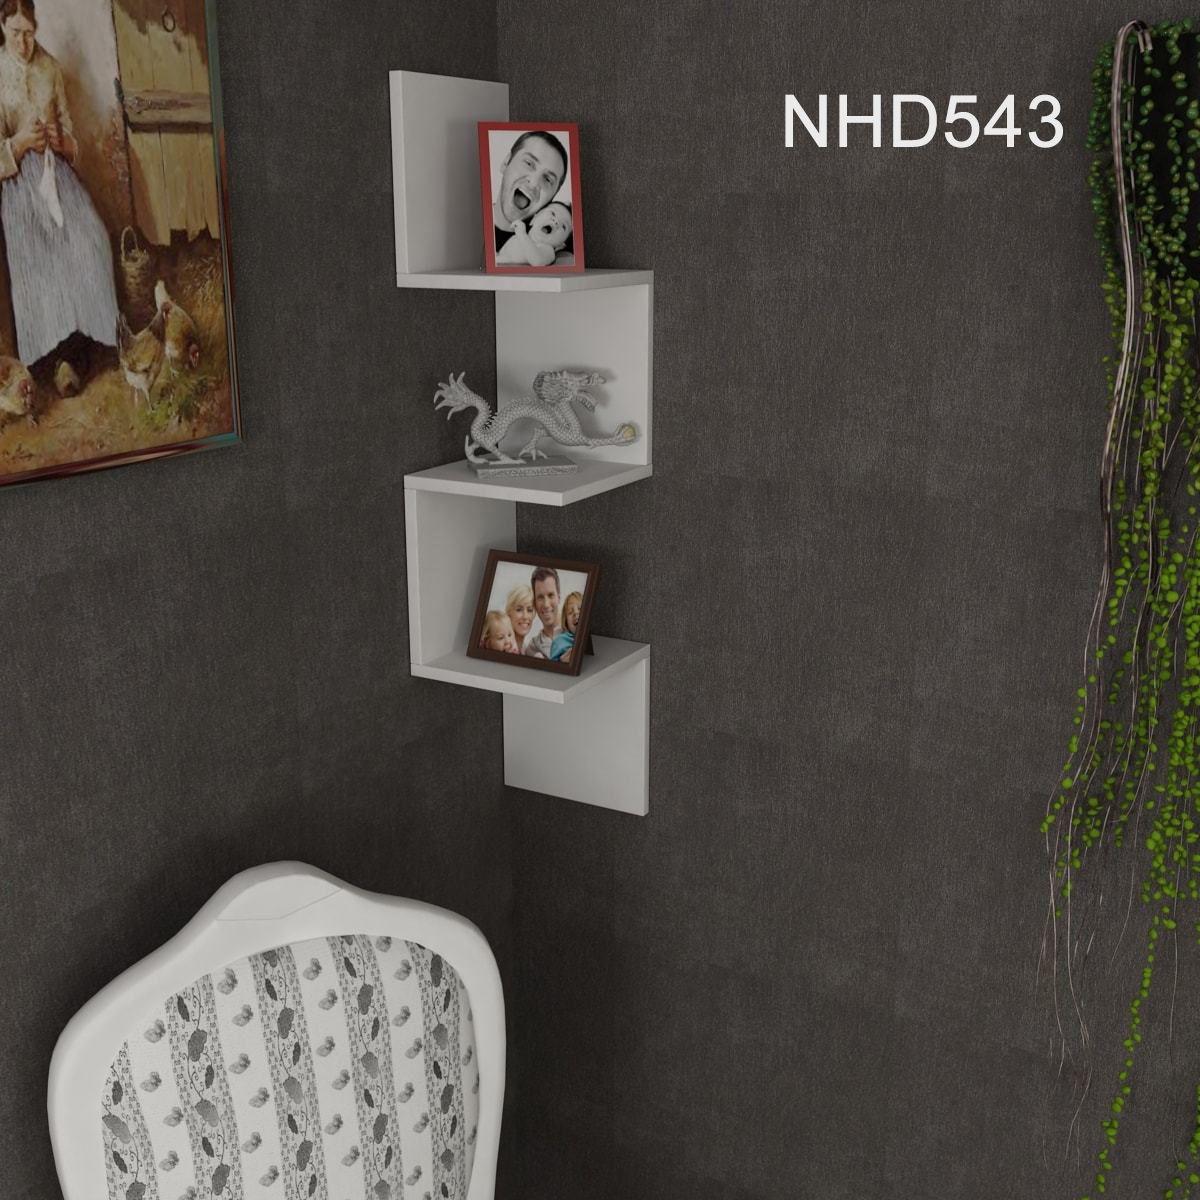 Pin By الحساب الرسمي لتجارة بلا حدود On Art Sketches In 2020 Modern Wall Shelf Wall Shelves Wall Storage